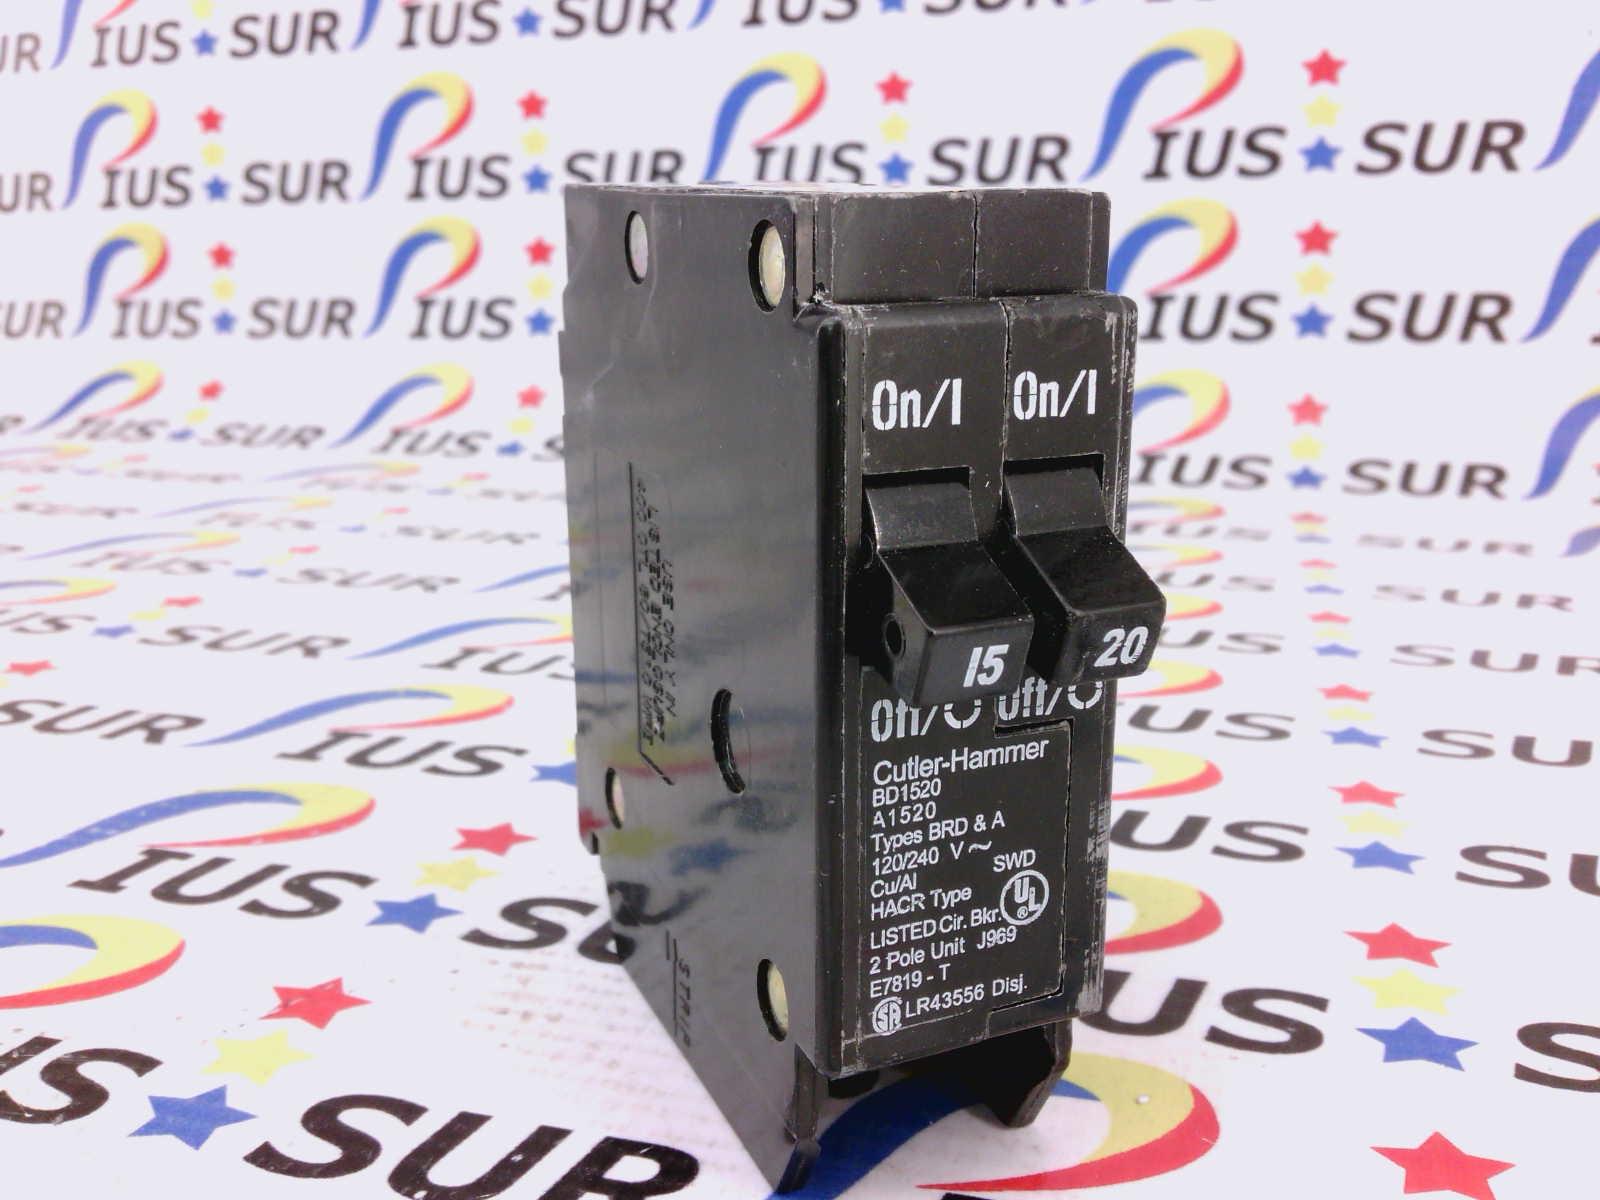 Rv Fuse Box Electrical Schematics Diagram Heartland Wiring Single Pole Detailed Ac Parallax Power Supply 3050